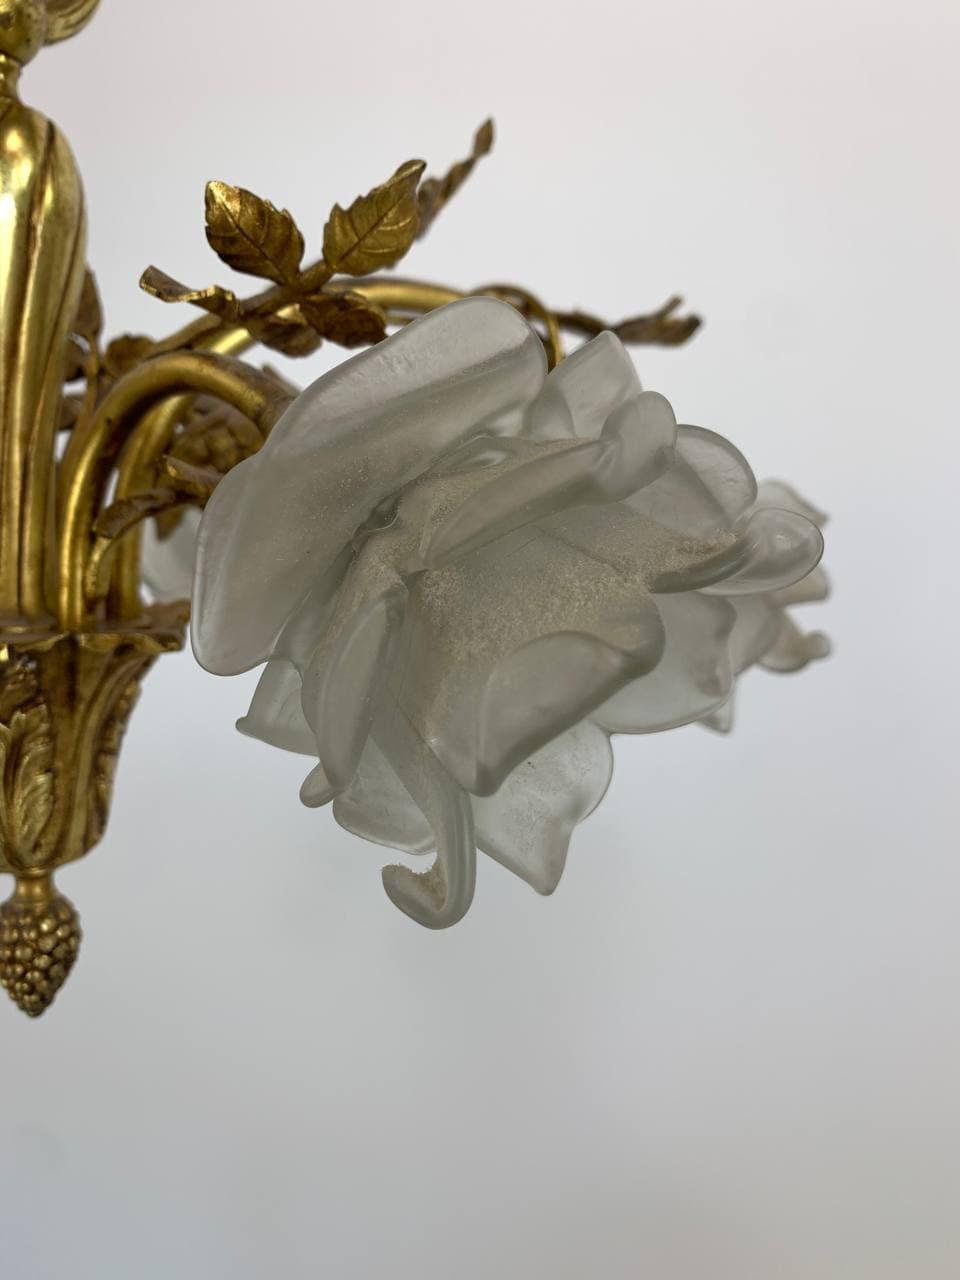 Антикварная люстра на 6 огней в стиле Louis XVI